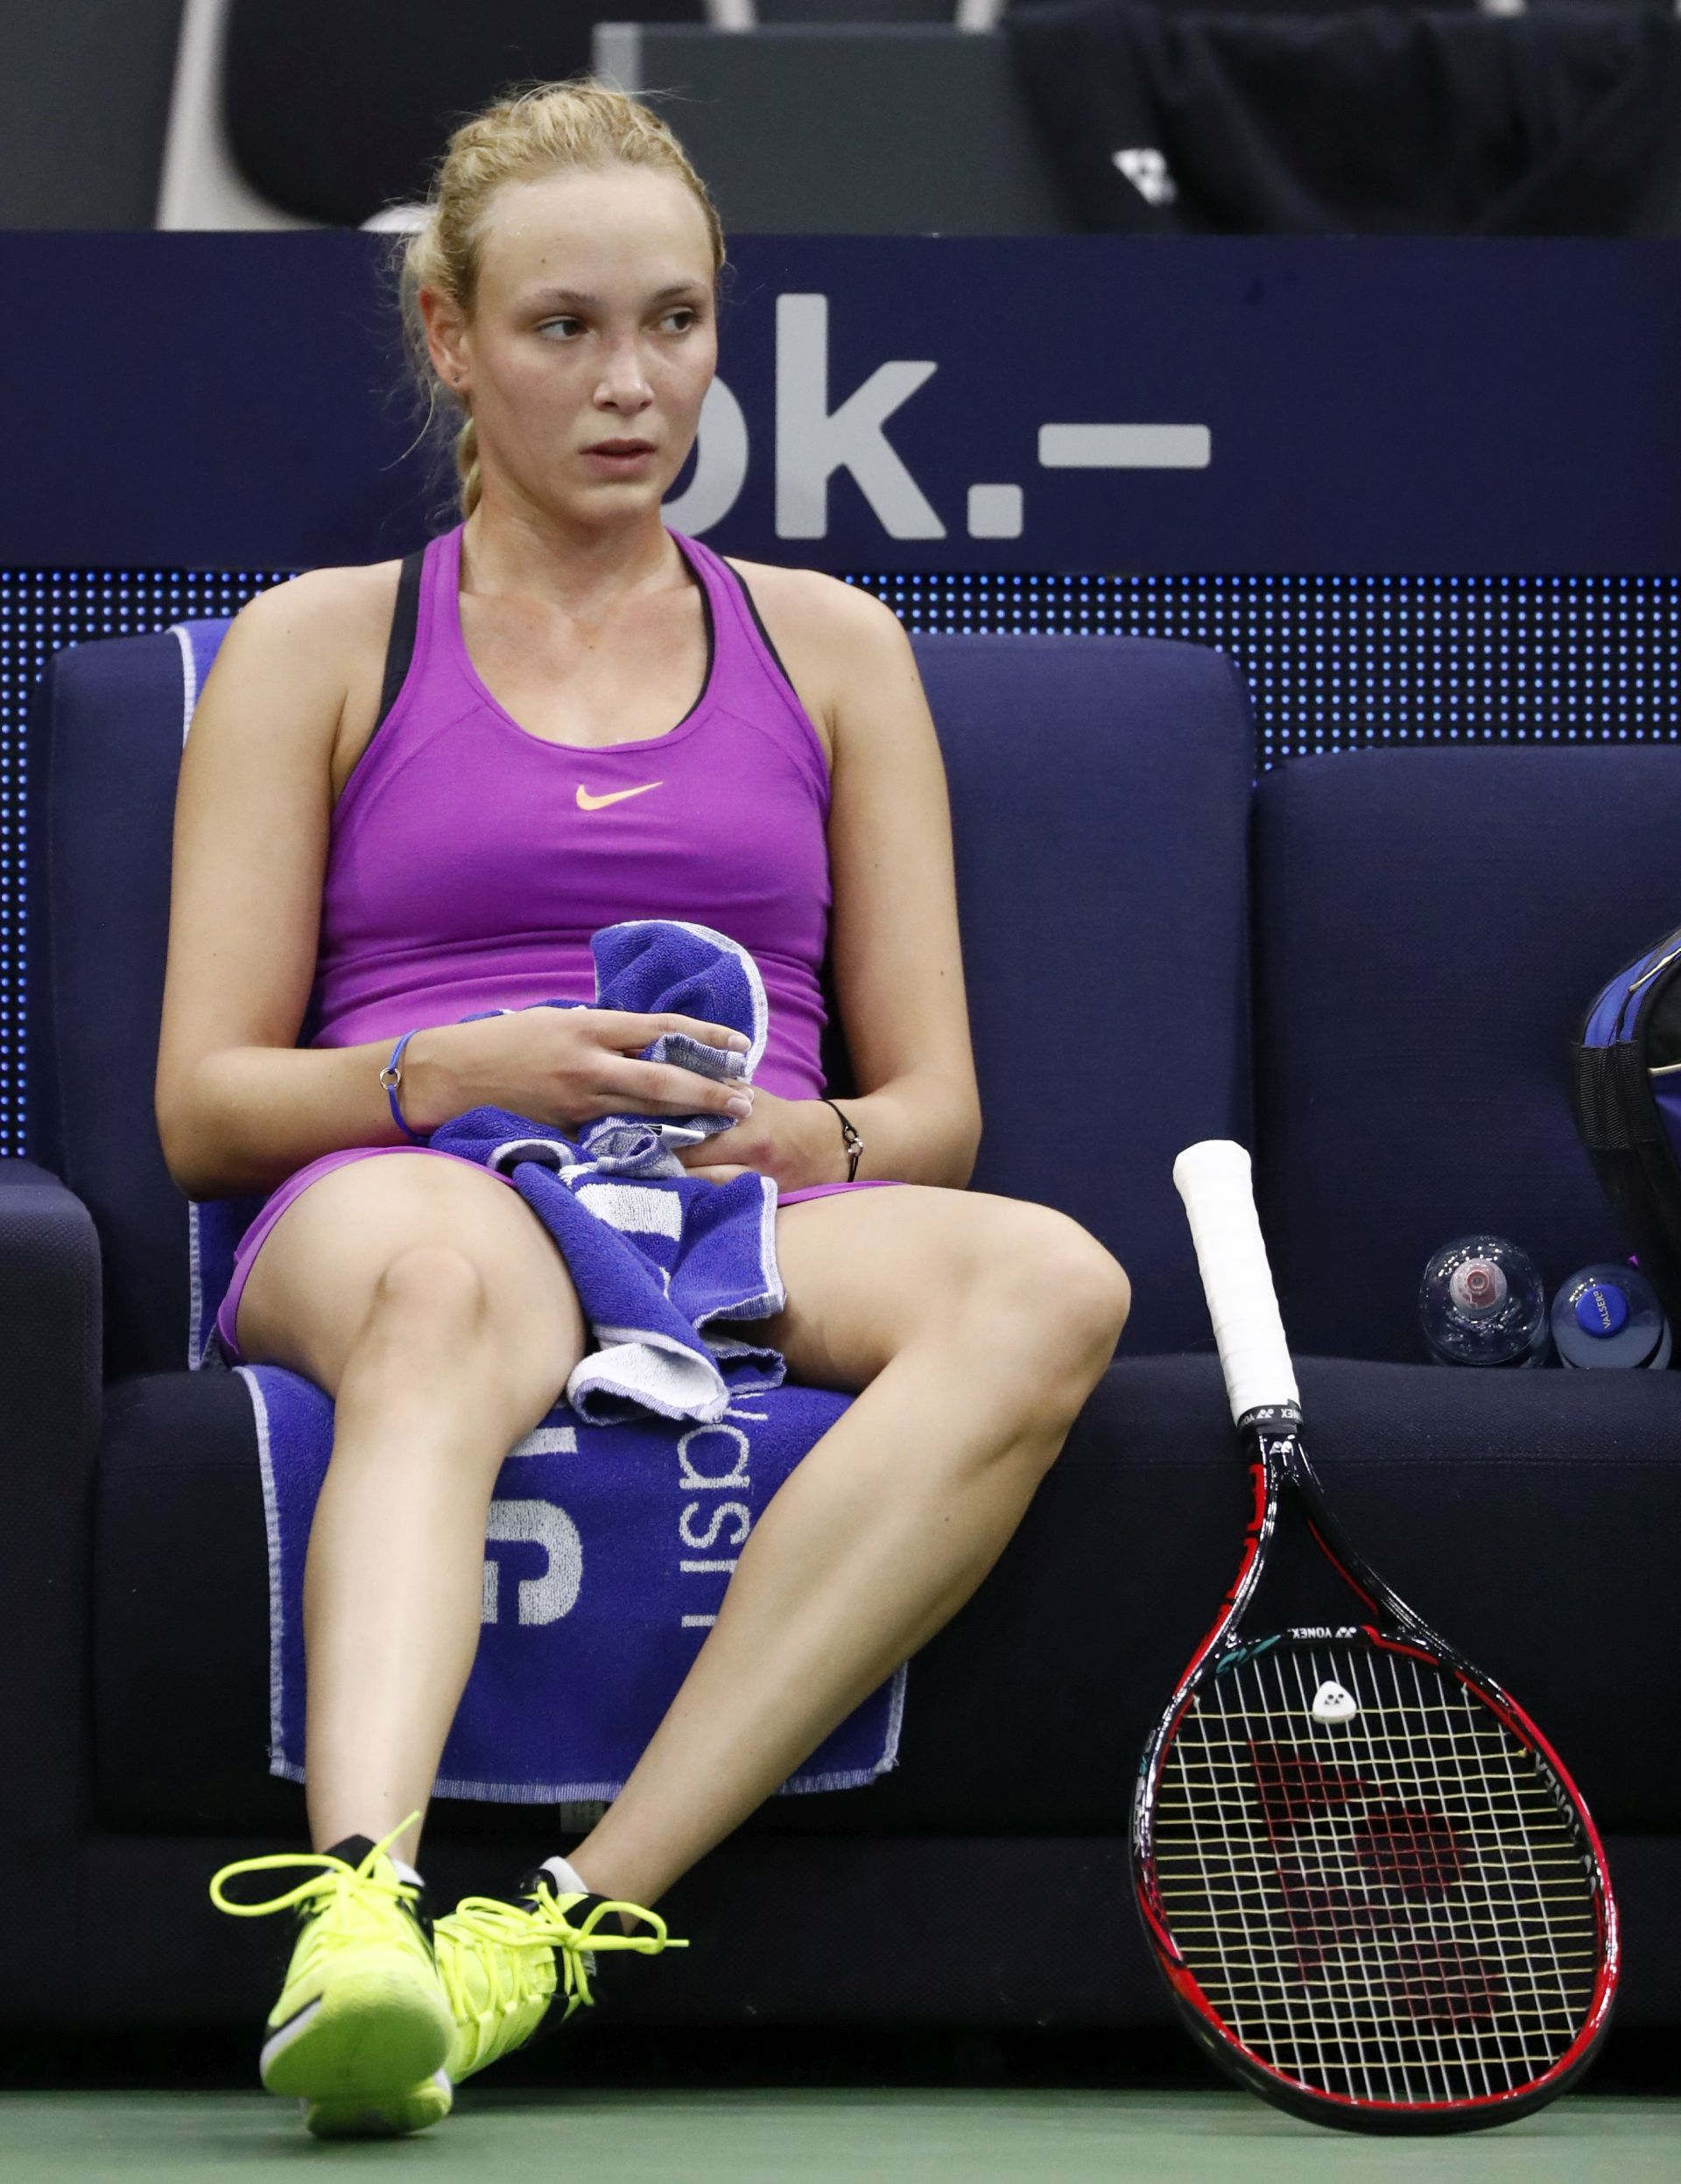 WTA BIEL Kraj za Vekić